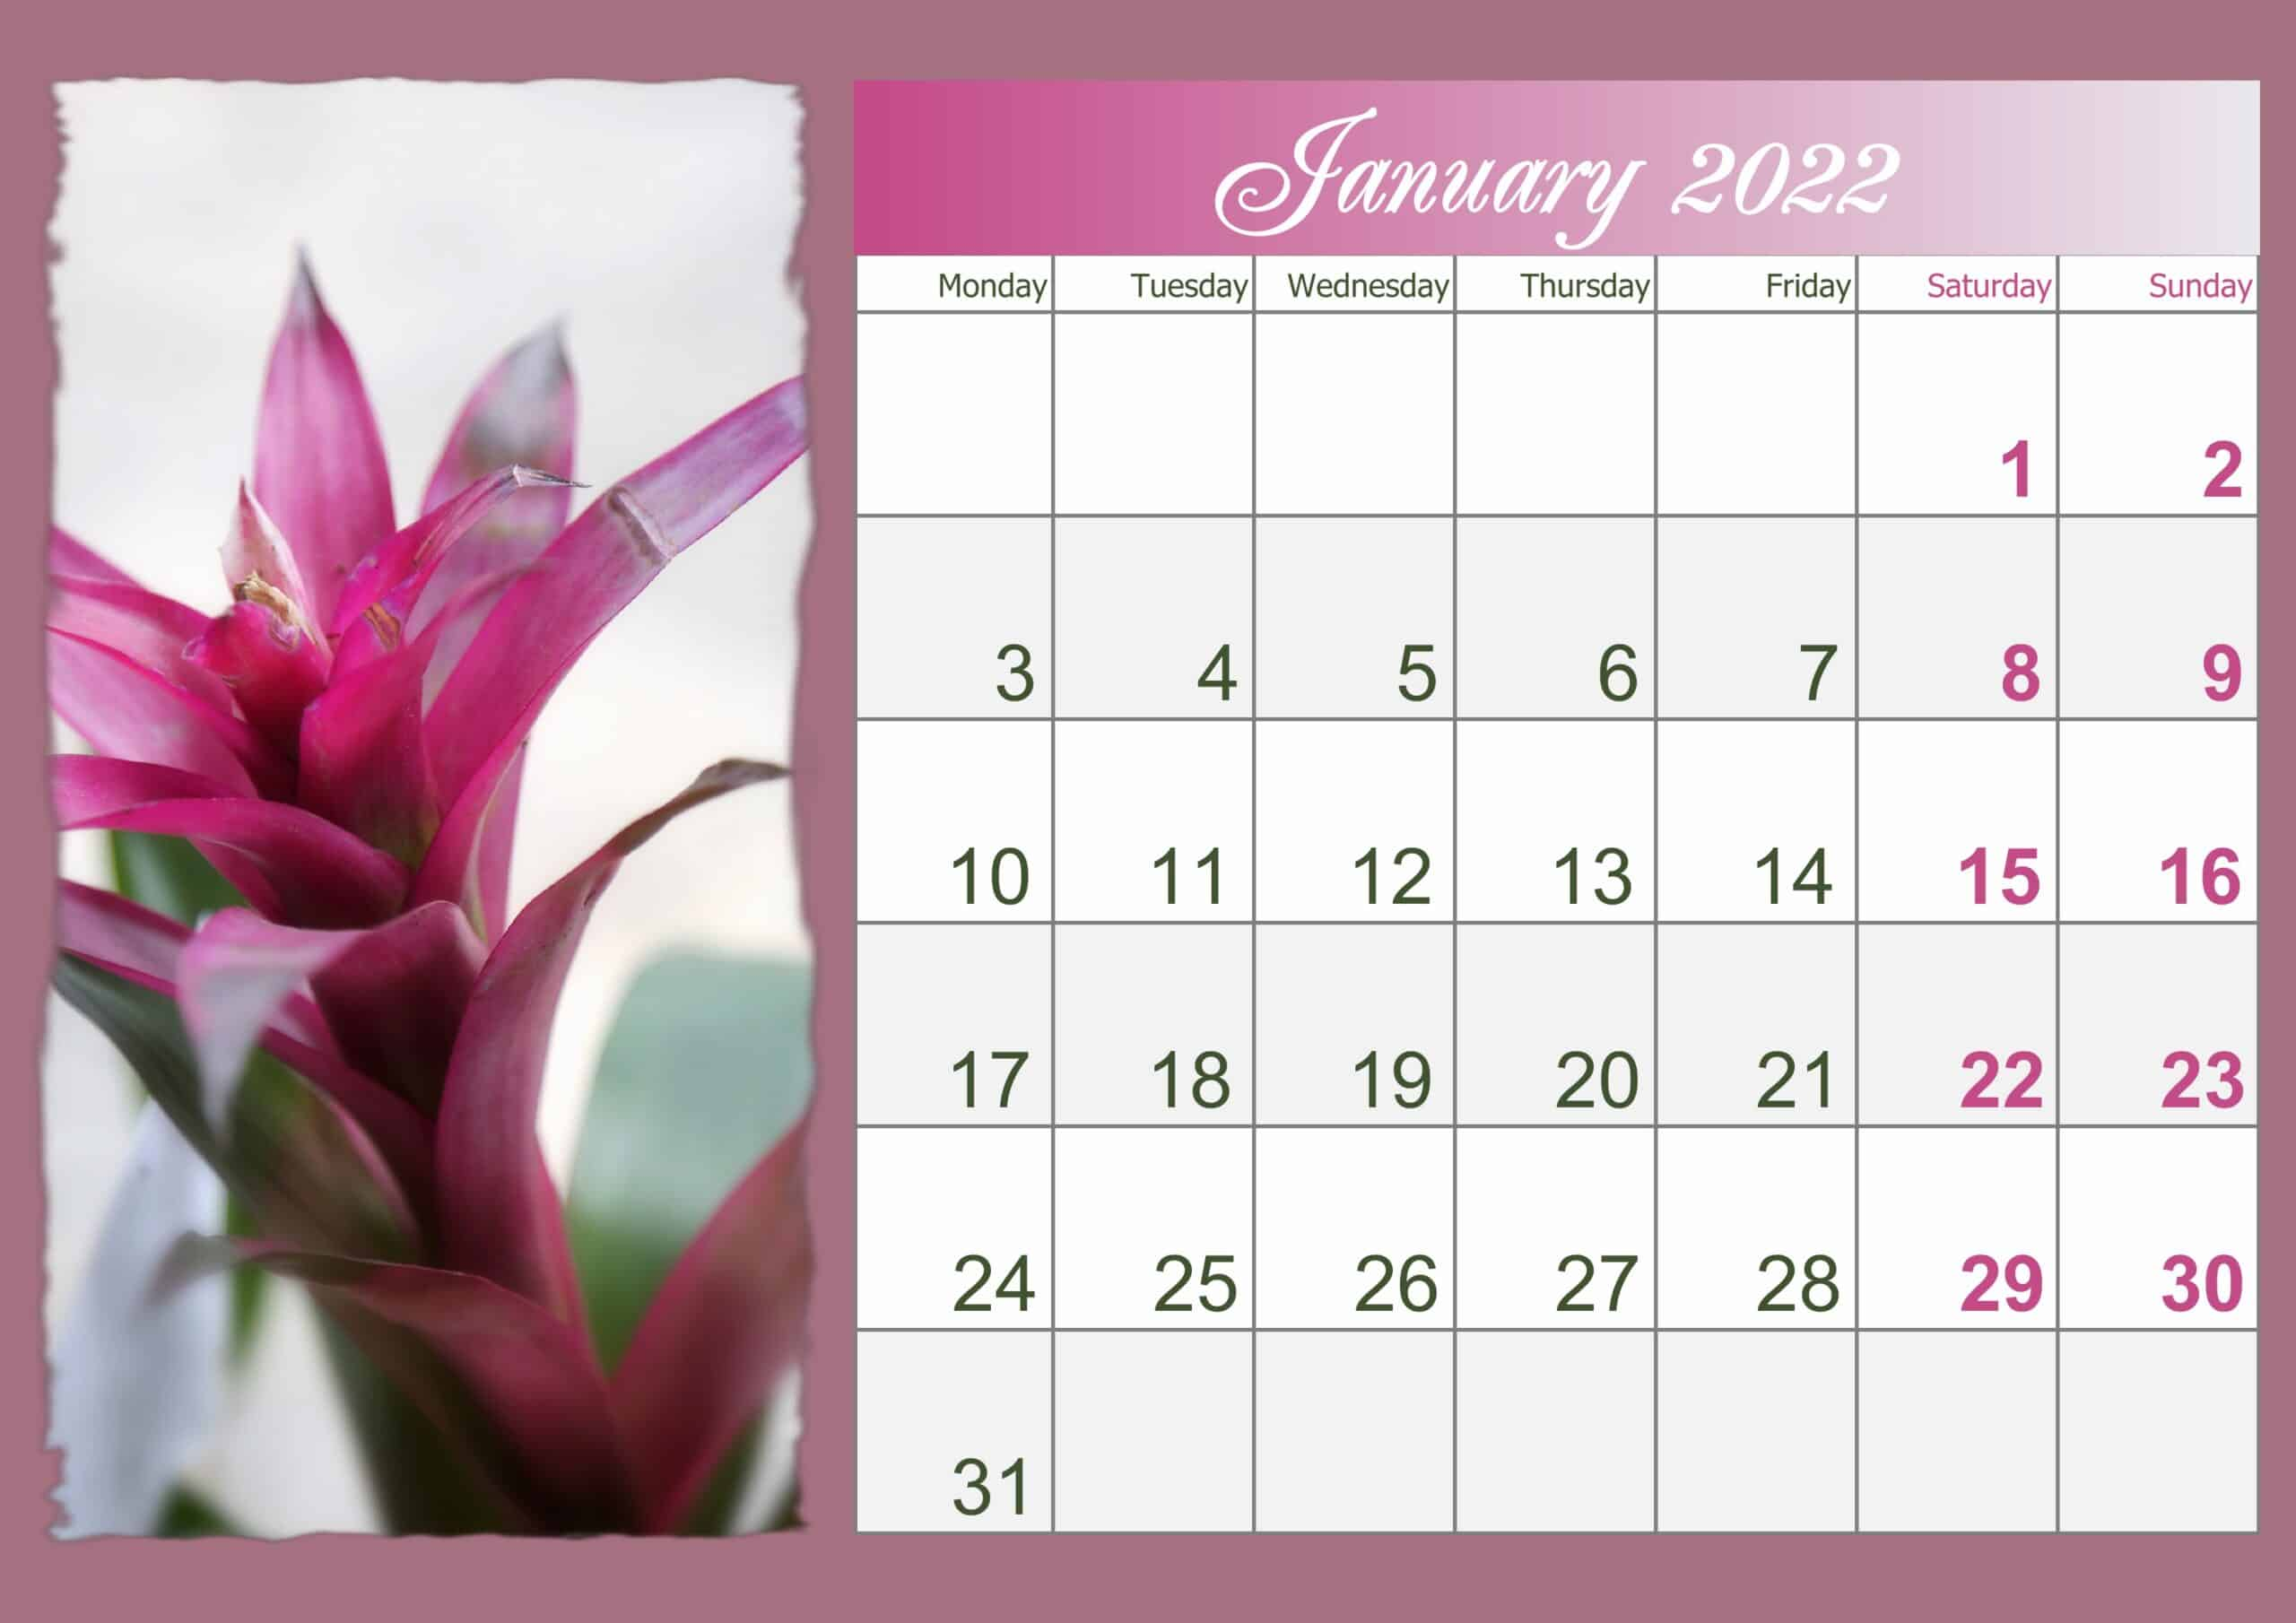 January Printable 2022 Calendar